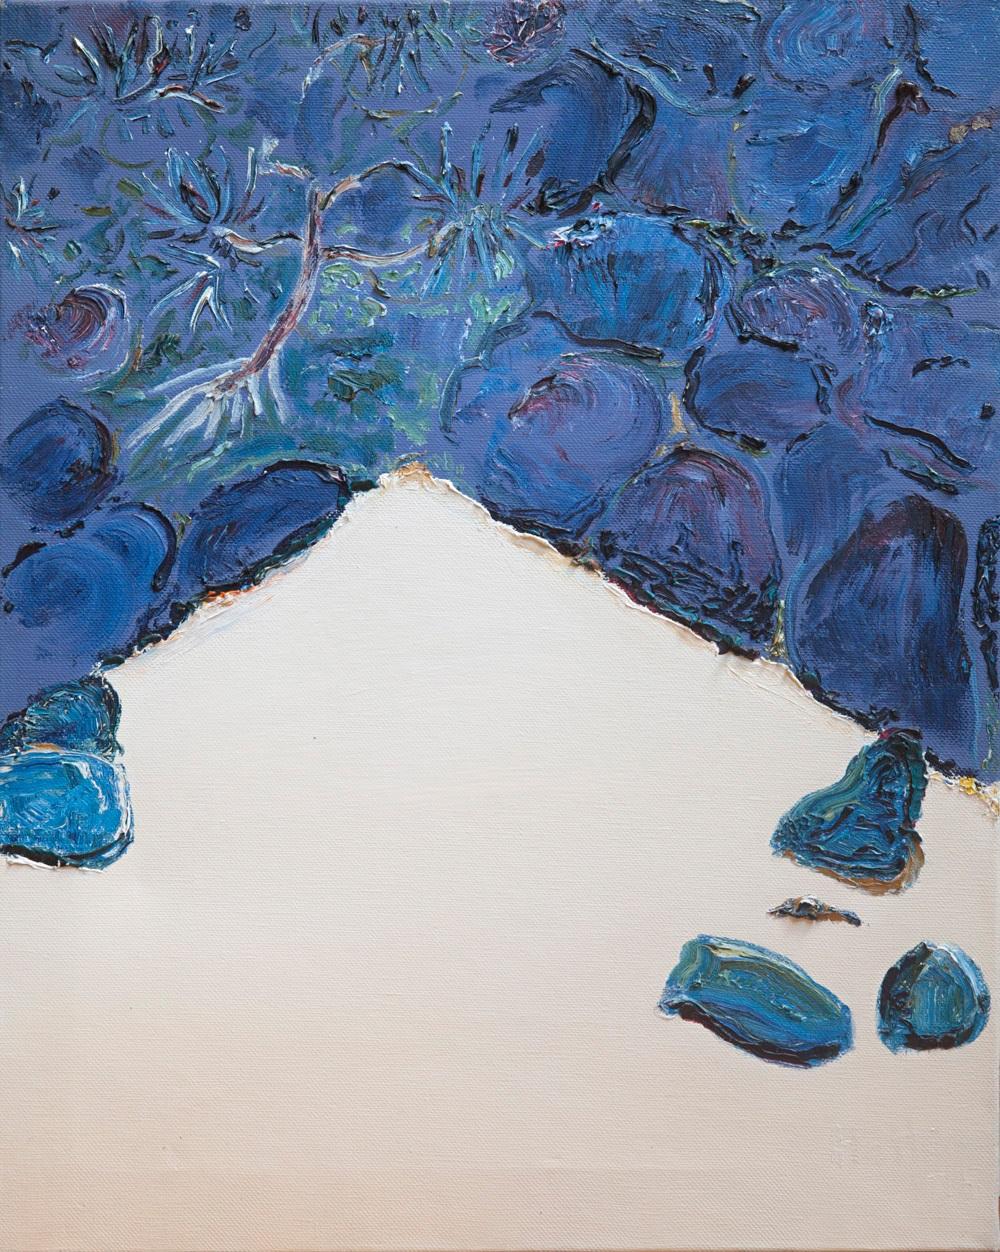 Hal Hattam, Fraser Island Rocks, oil on canvas, 61x76cm $8500